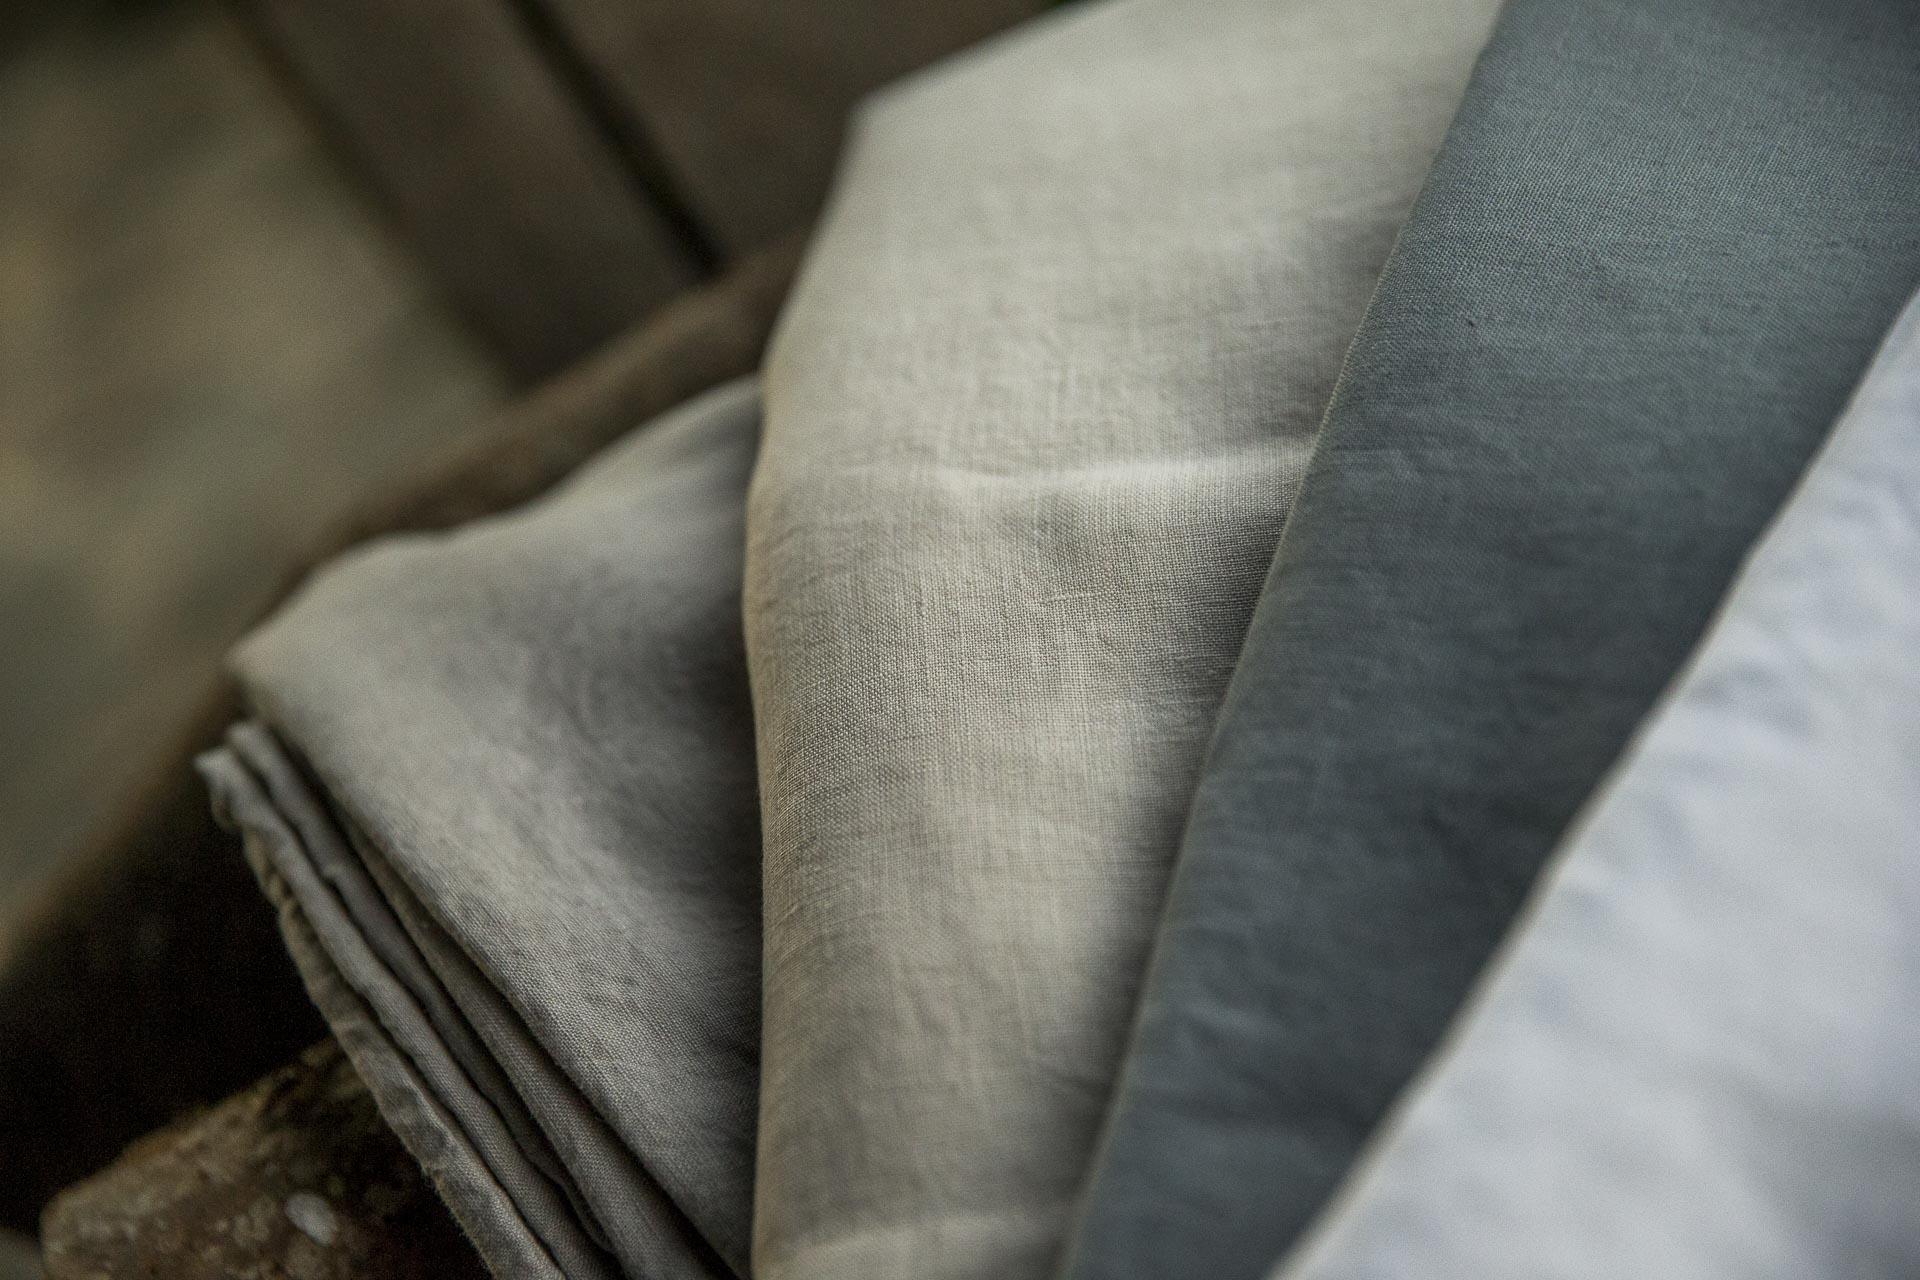 L&L_Textiles©stephane_leroy-E61R5757.jpg